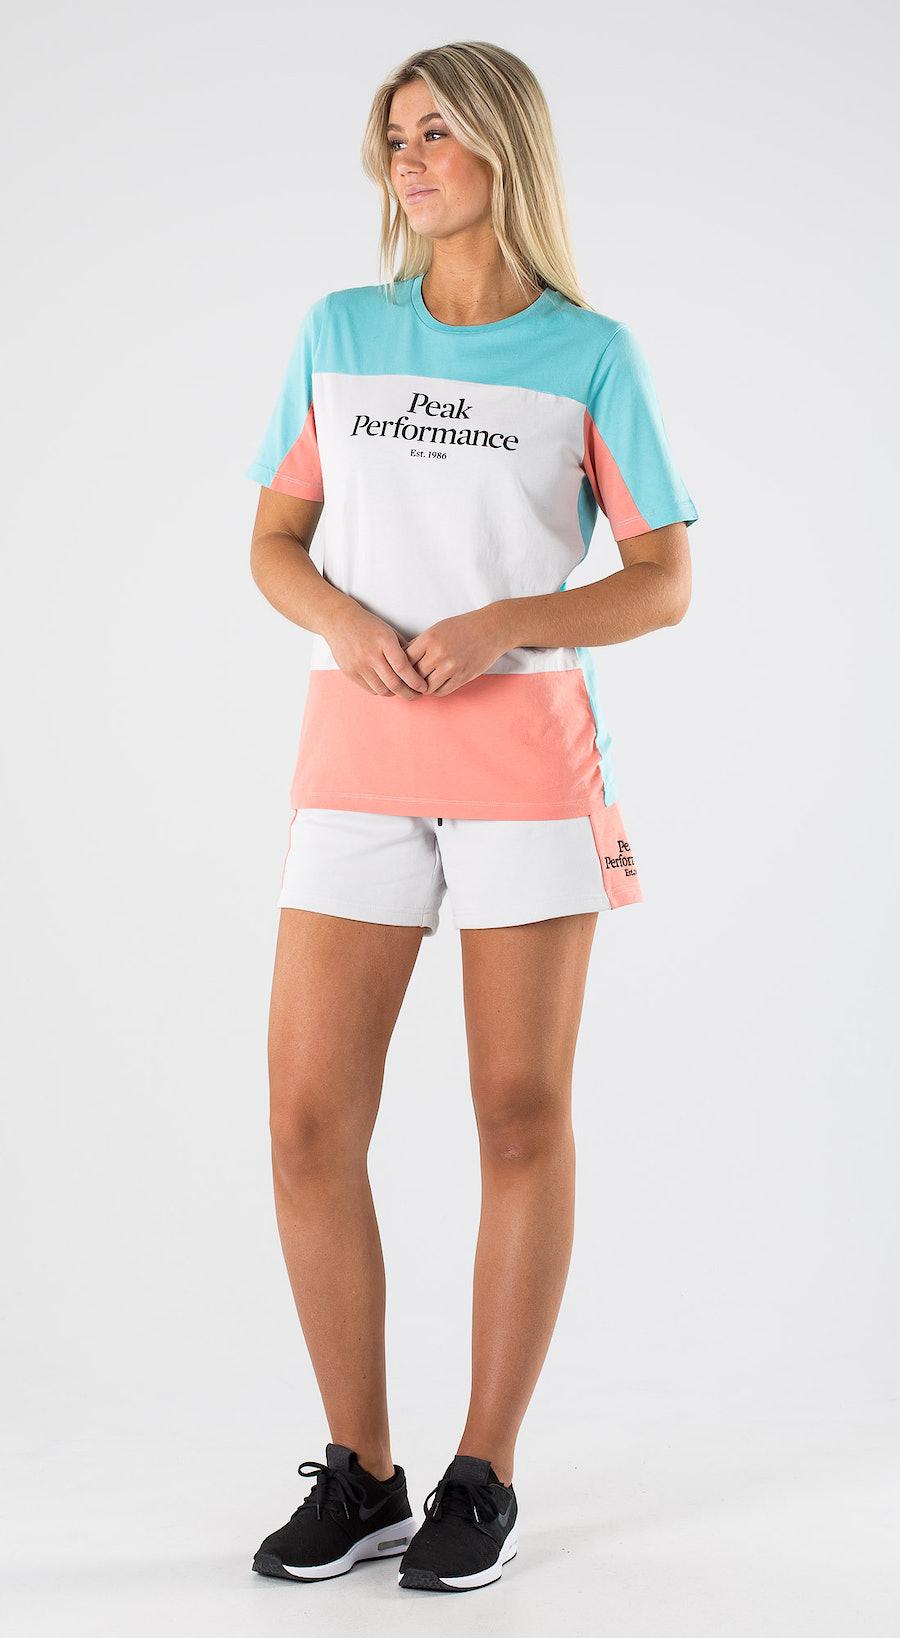 Peak Performance Original Blocked Tee Antarctica Outfit Multi